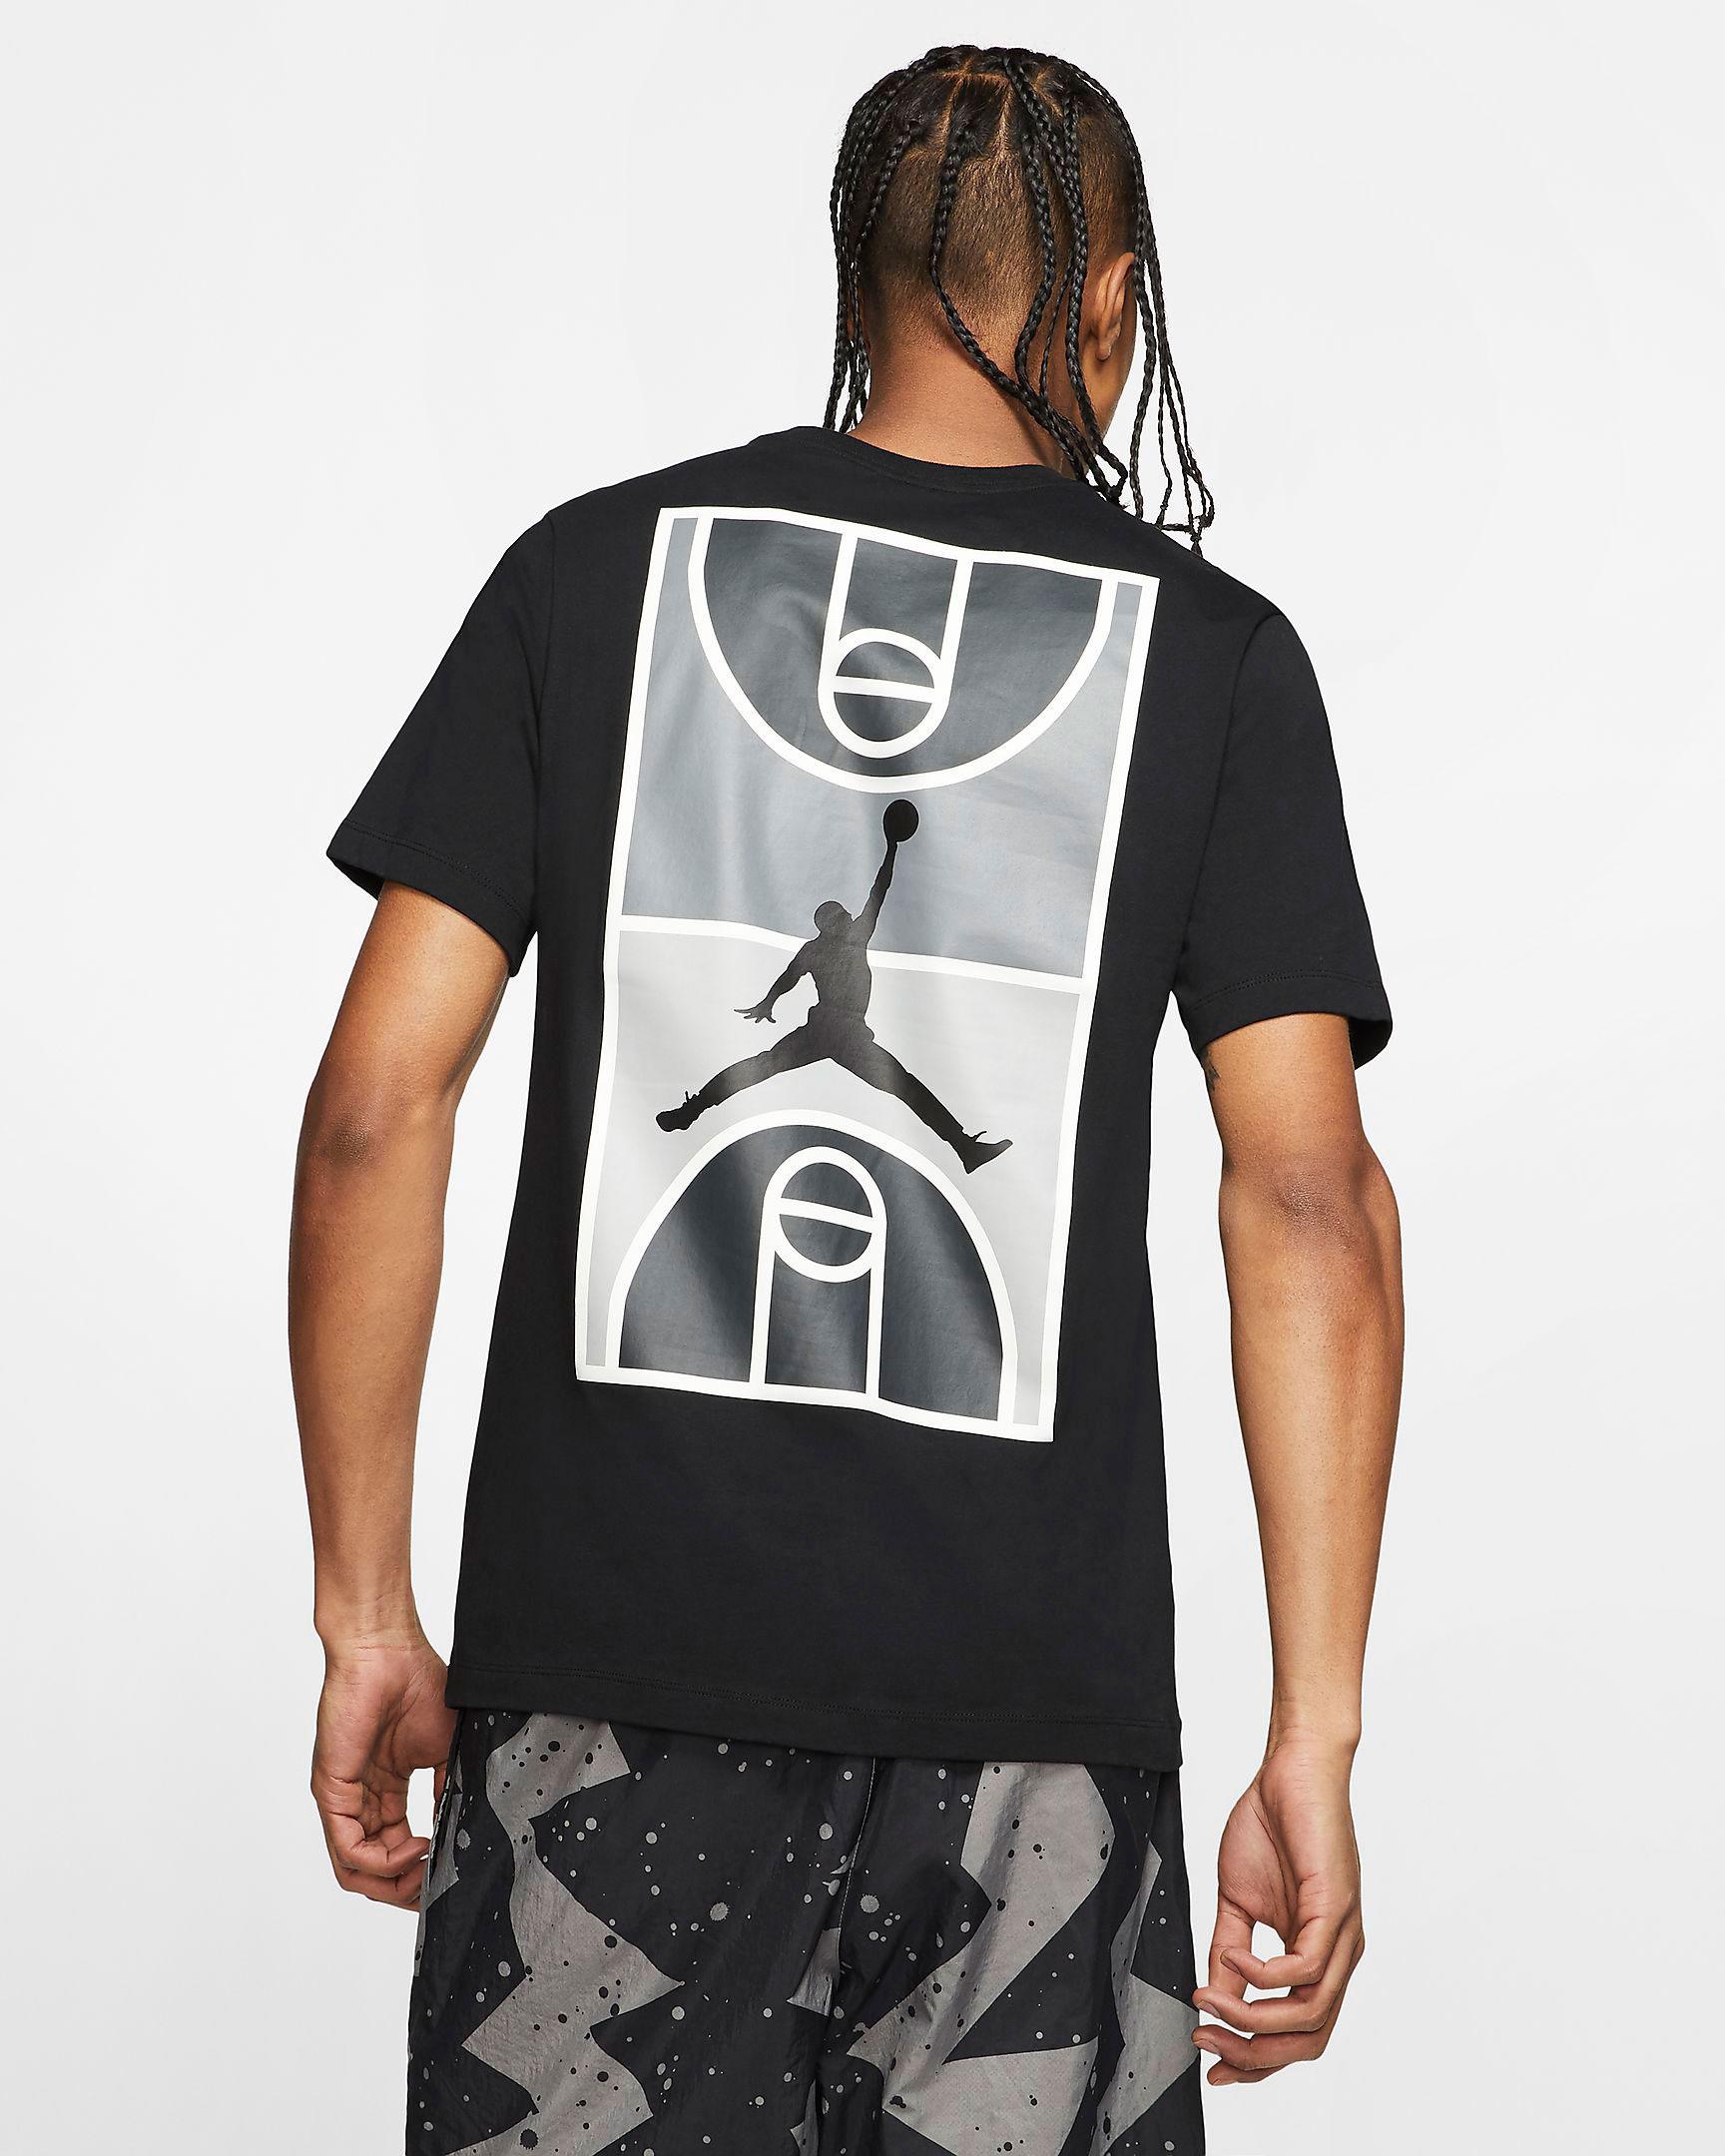 jordan-11-low-black-cement-shirt-match-5